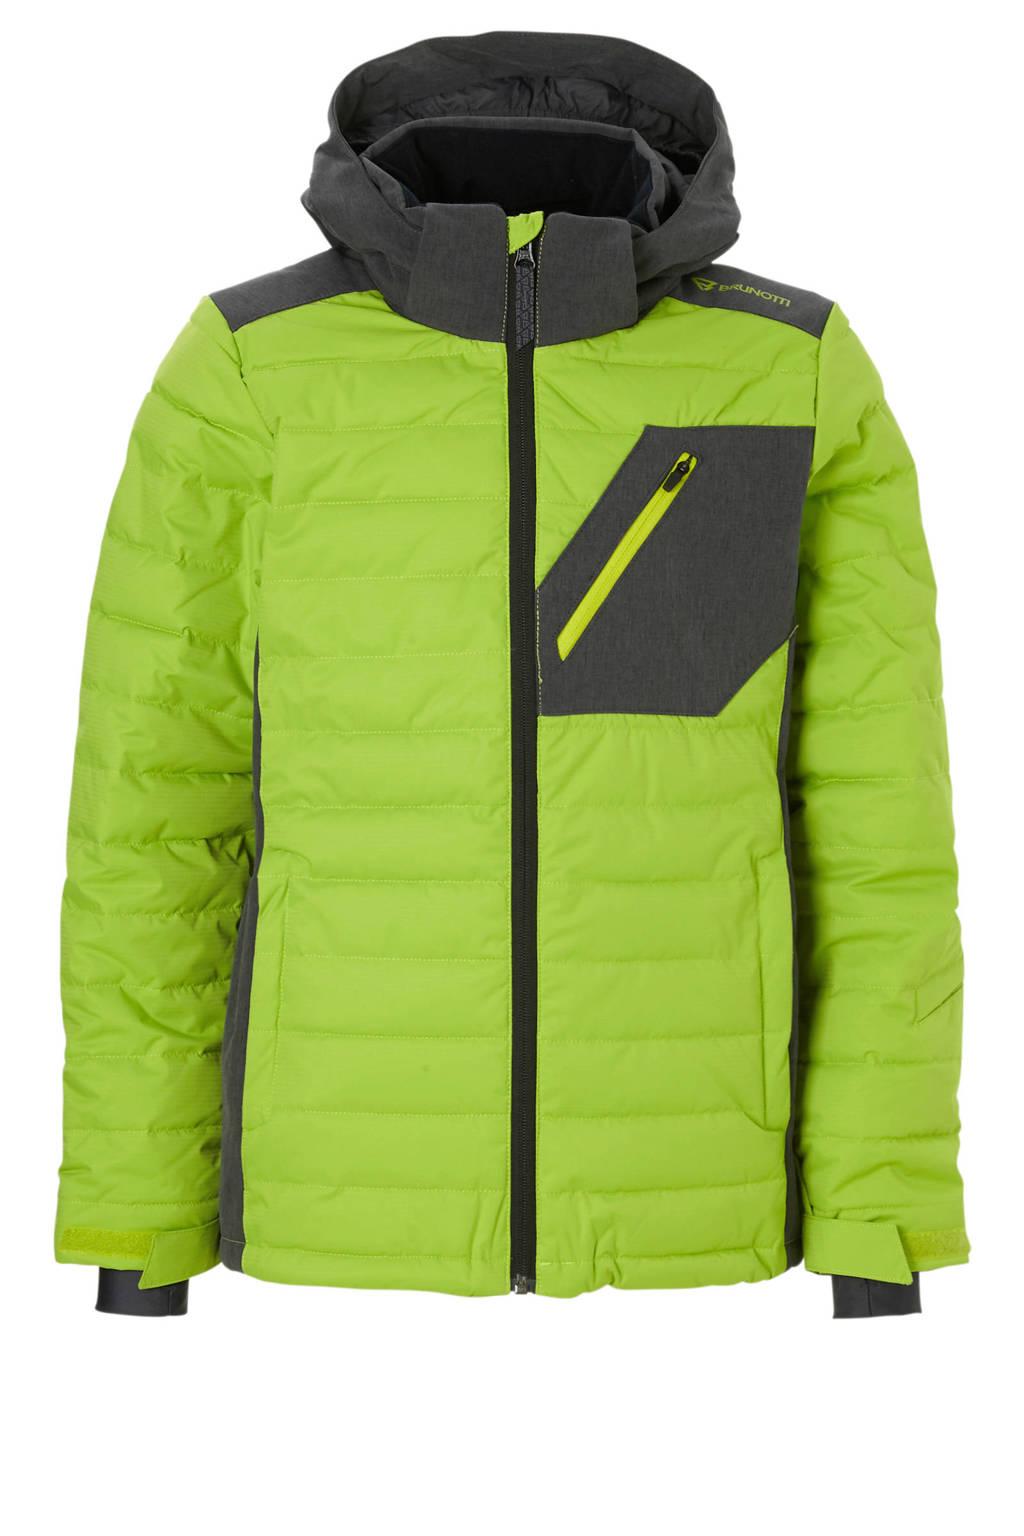 Brunotti ski-jack Trysail limegroen, Limegroen/grijs